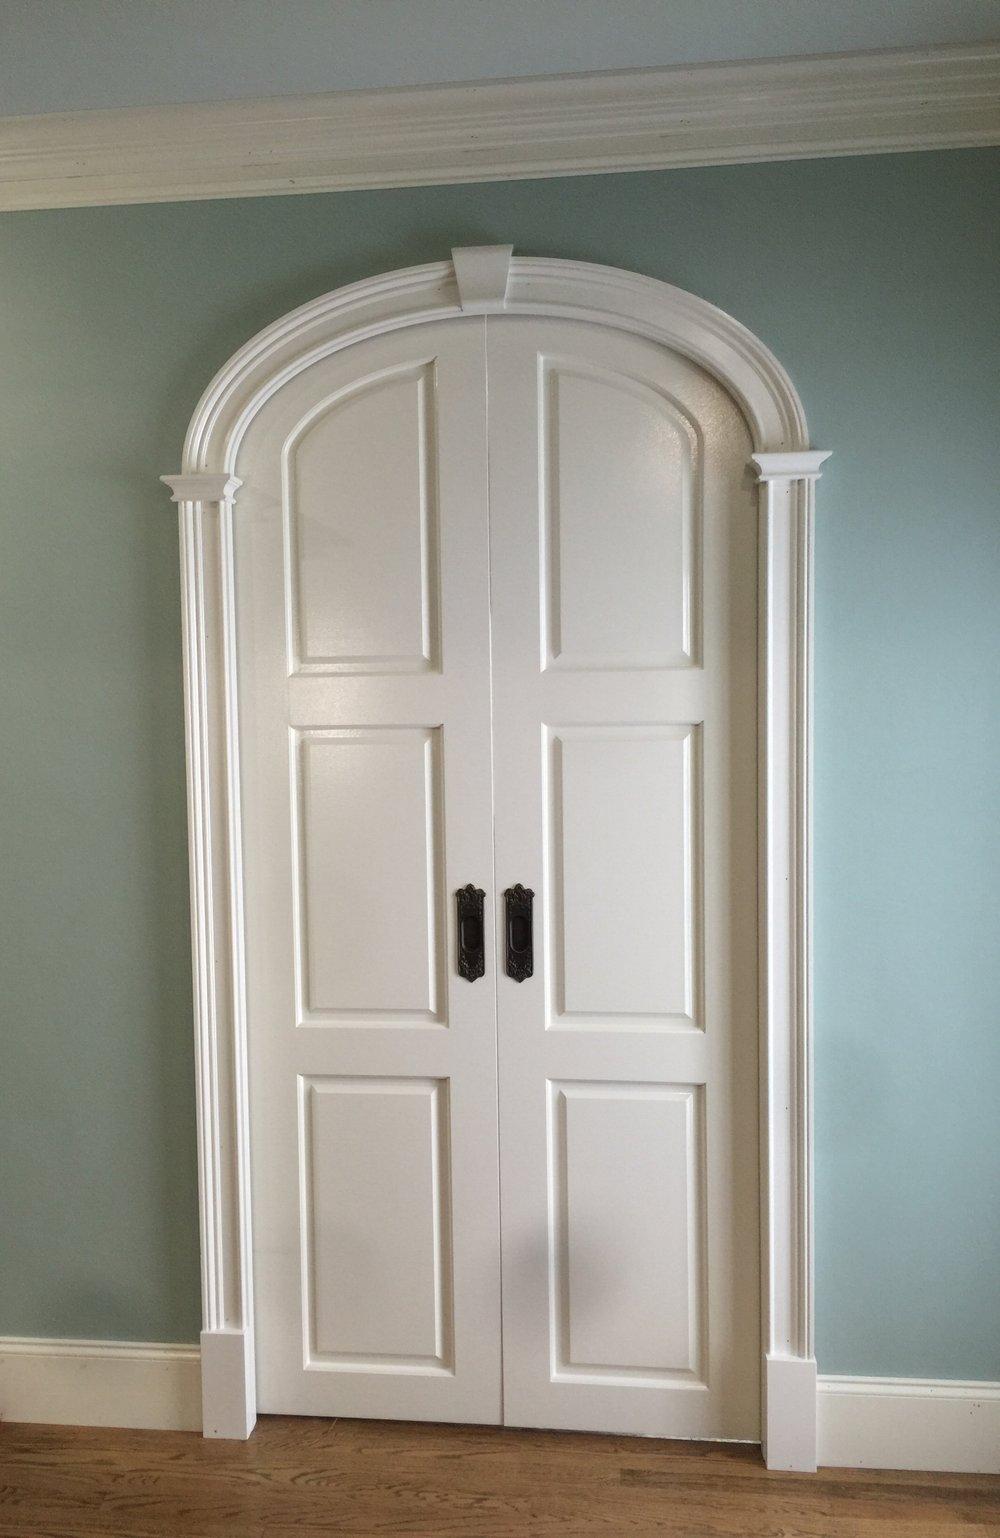 arched pocket doors - prefab arch kit split to fit concentric panel pocket doors!